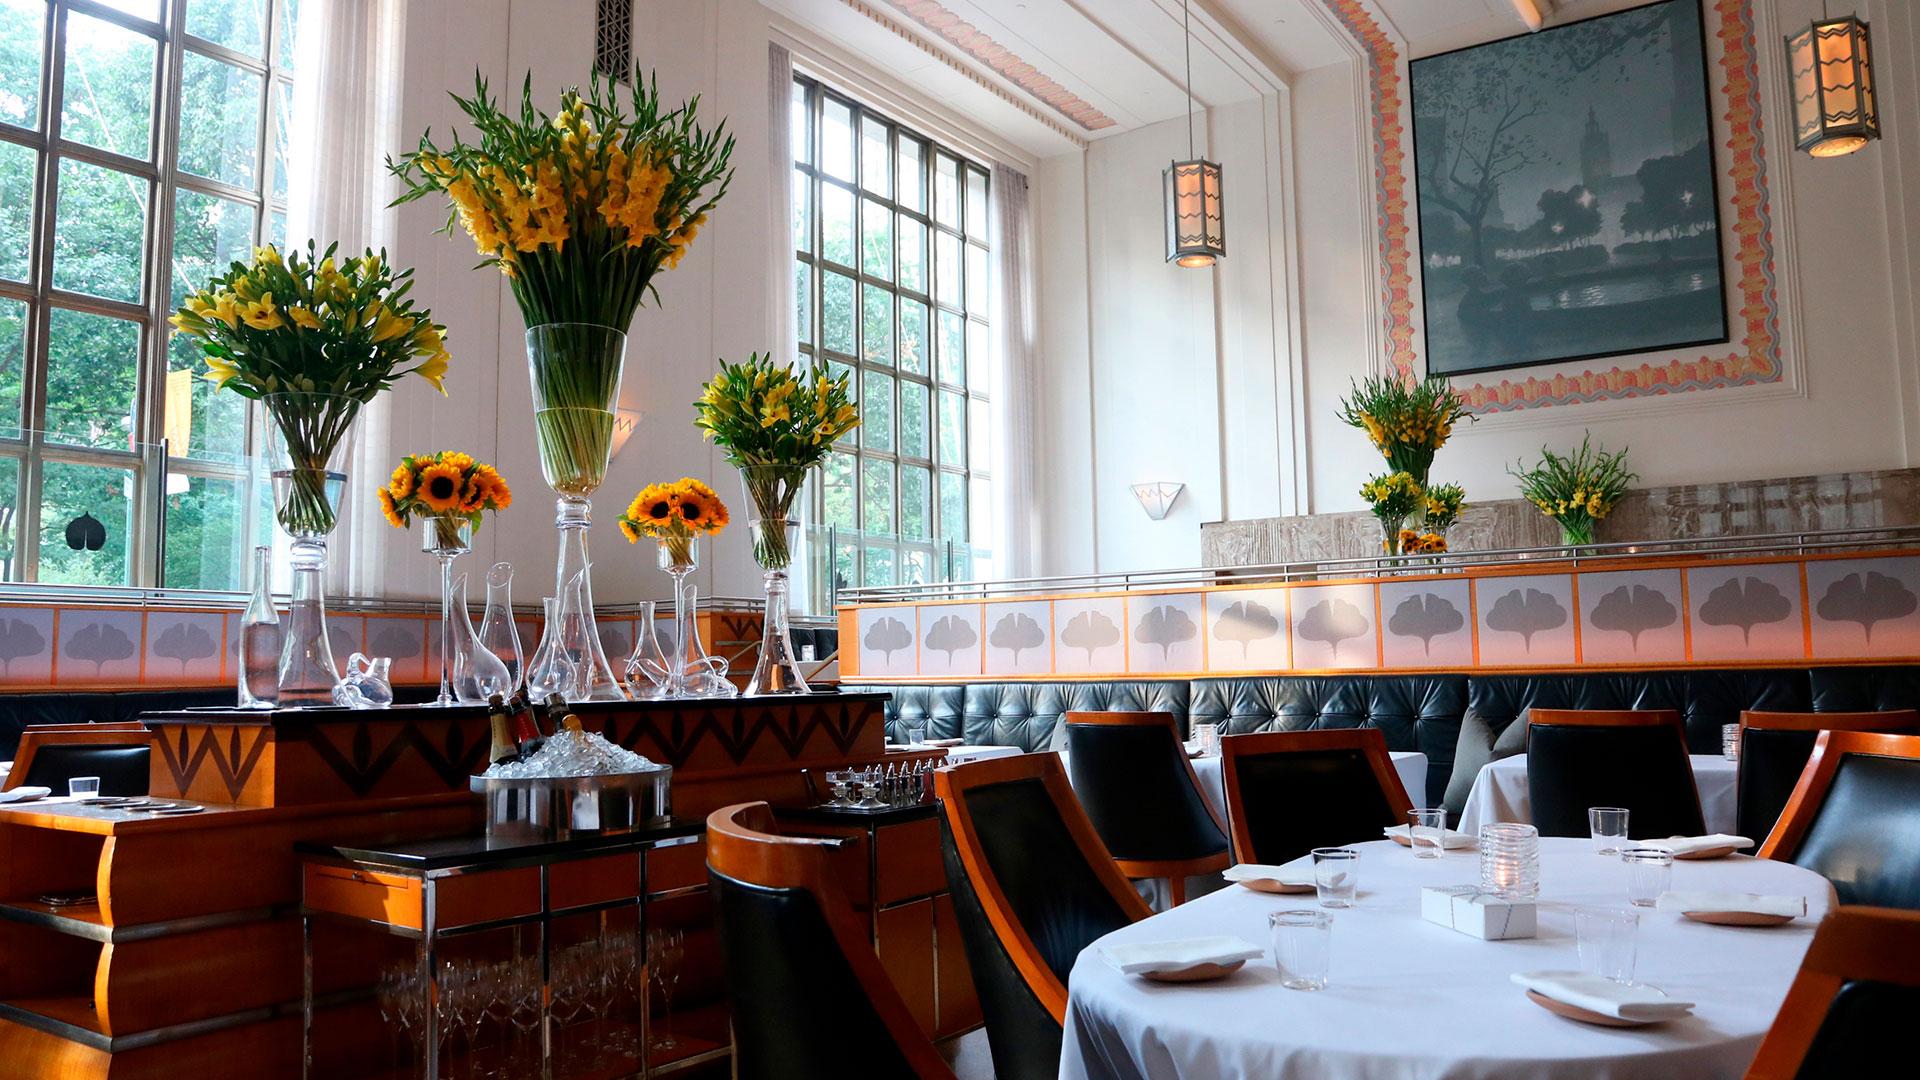 Imagen de las velas diseñadas por Marc Newson para Louis Vuitton